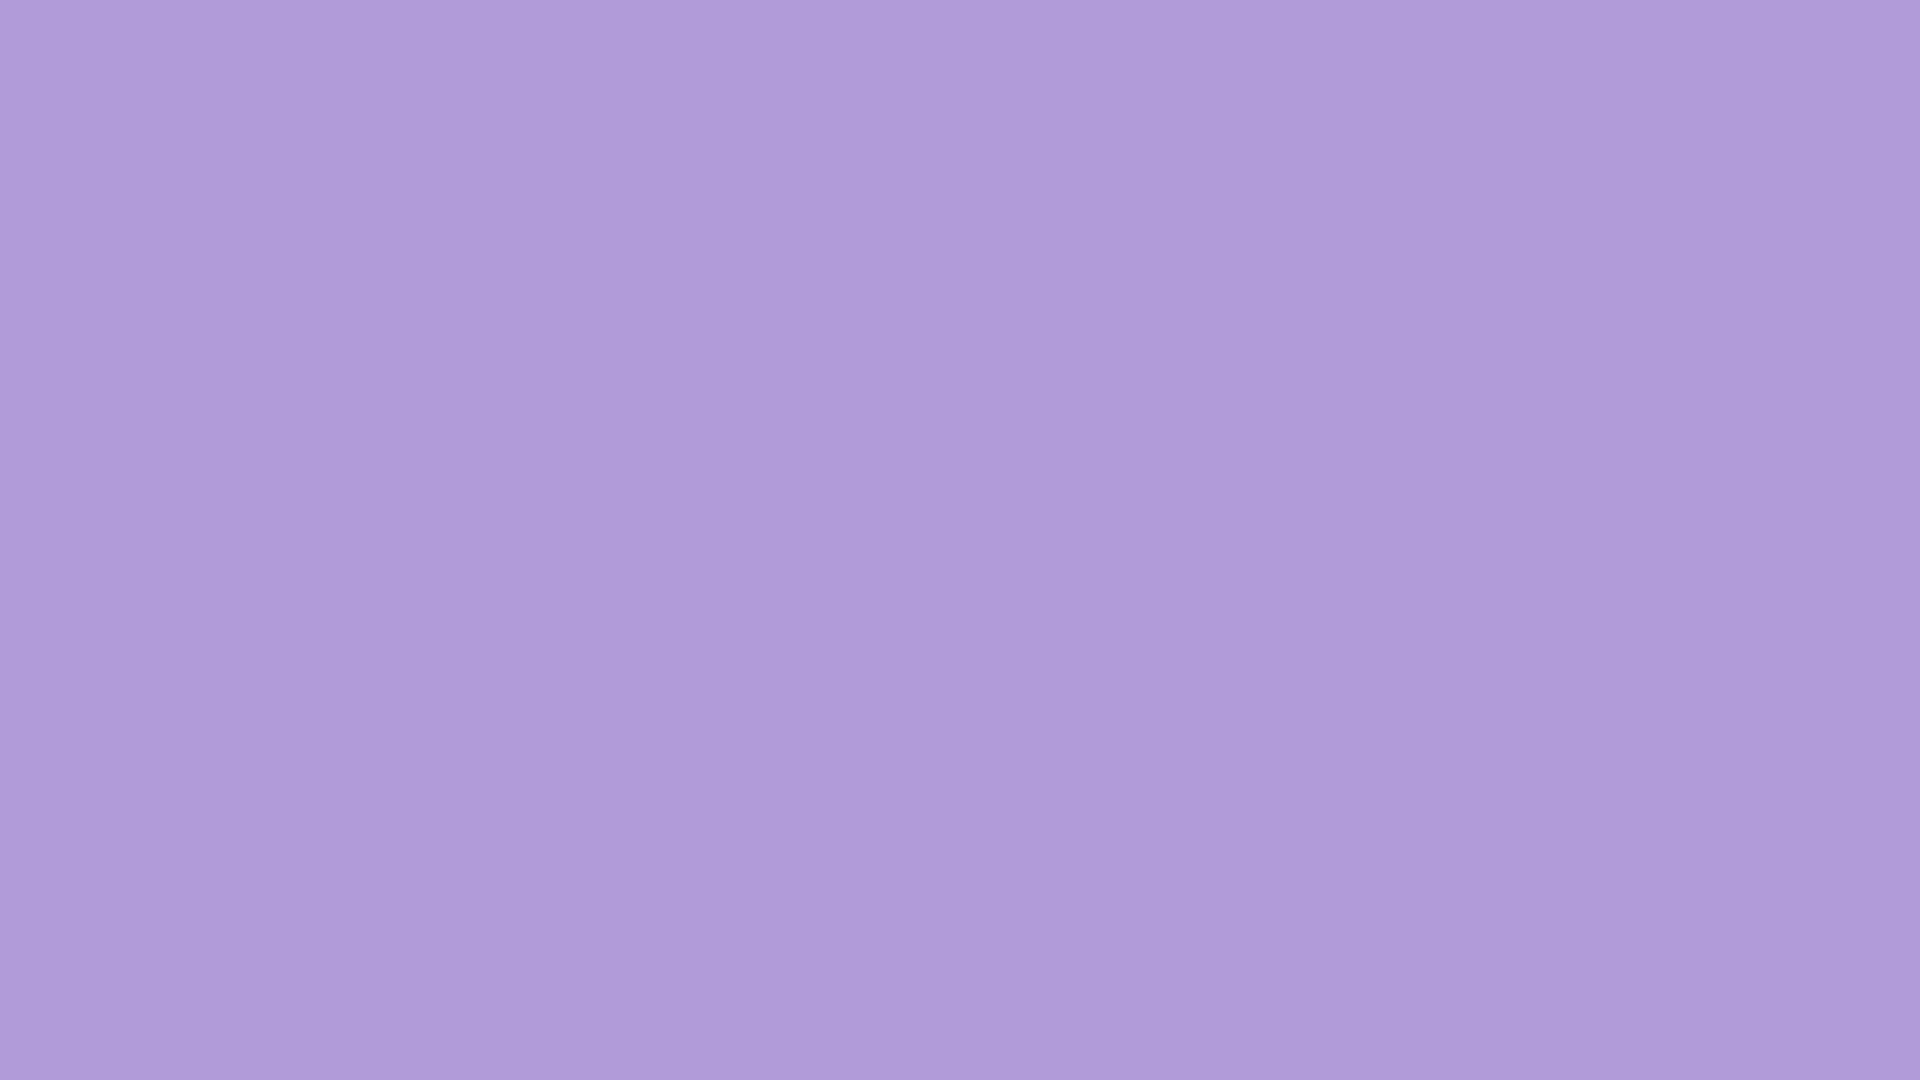 Pastel Purple Wallpapers Top Free Pastel Purple